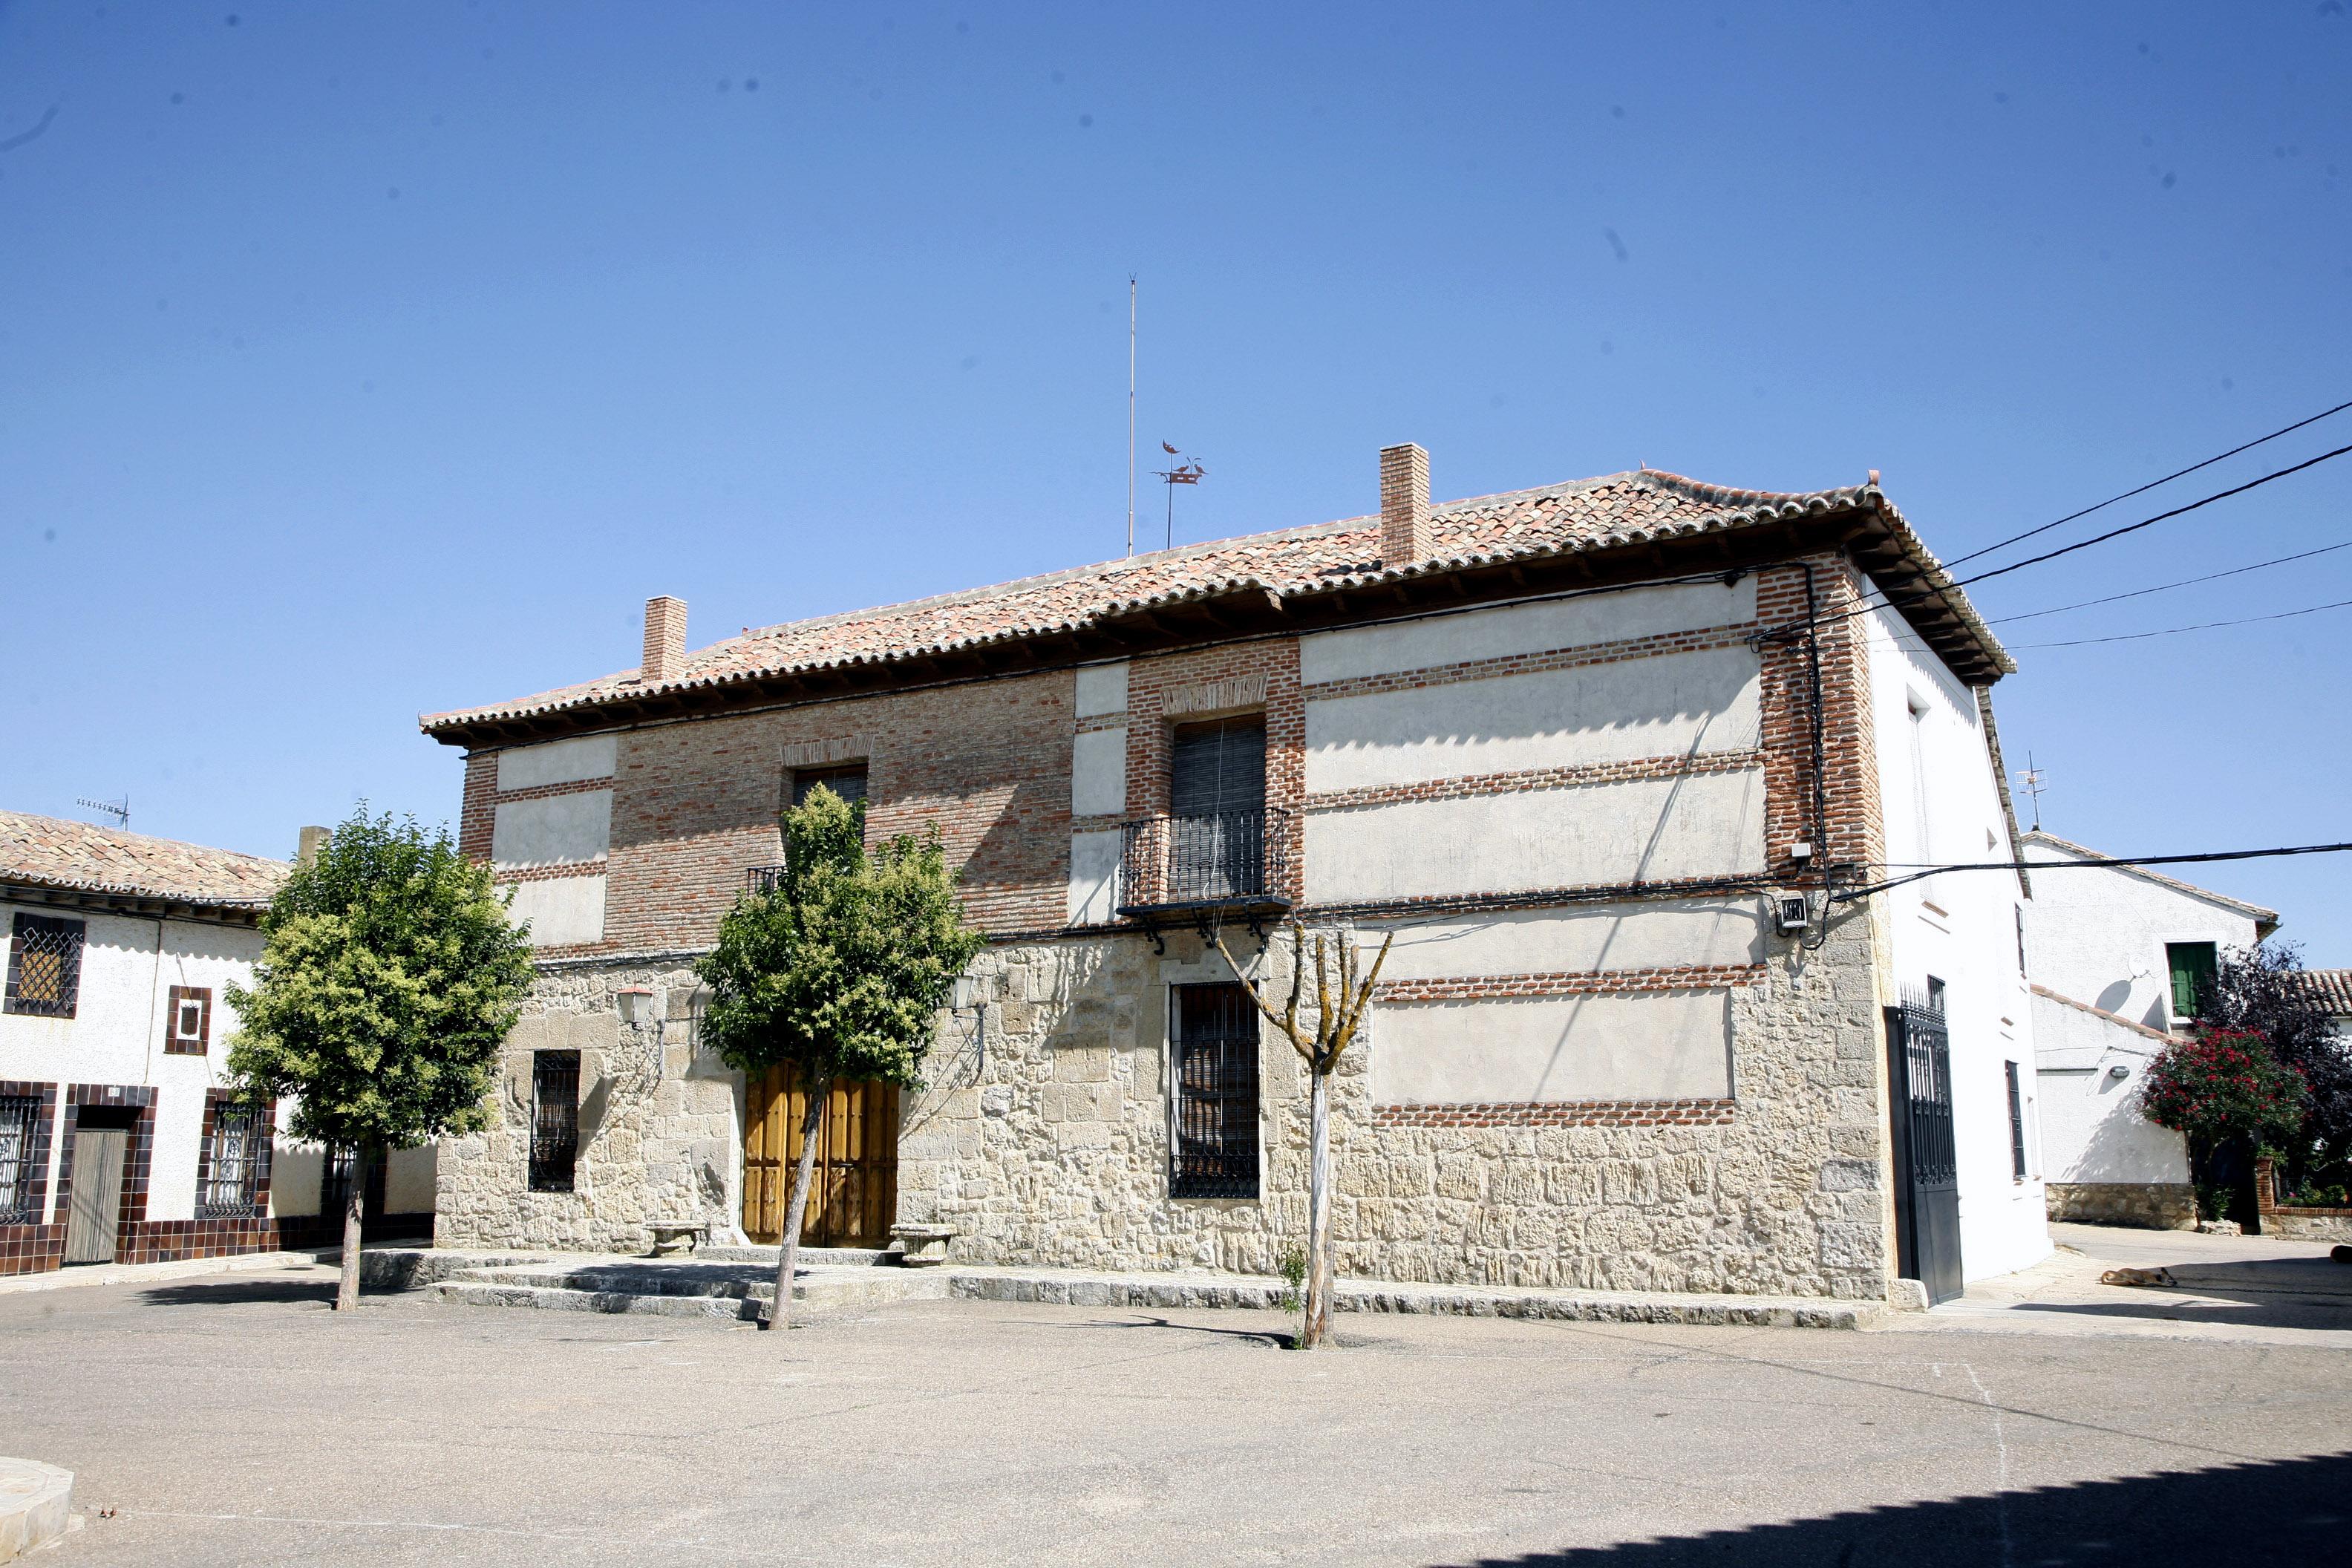 Villerias-rincón urb